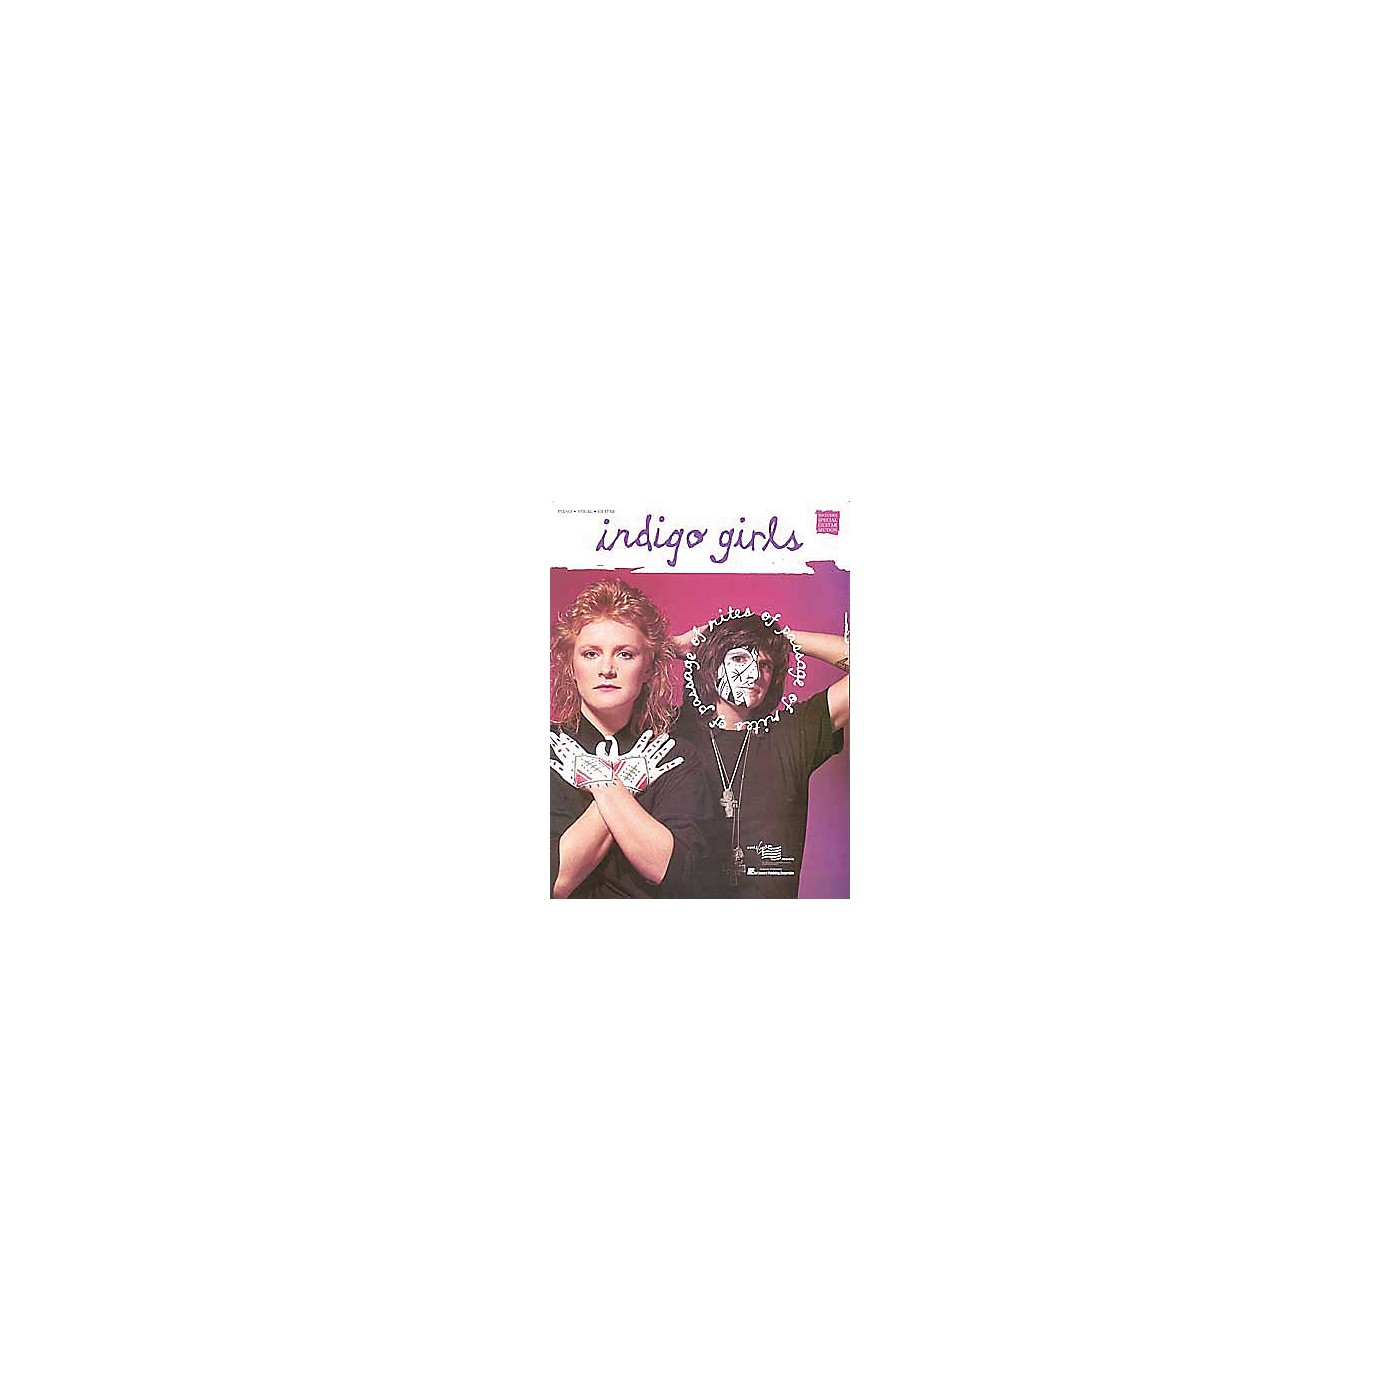 Hal Leonard Indigo Girls - Rites of Passage Piano, Vocal, Guitar Songbook thumbnail